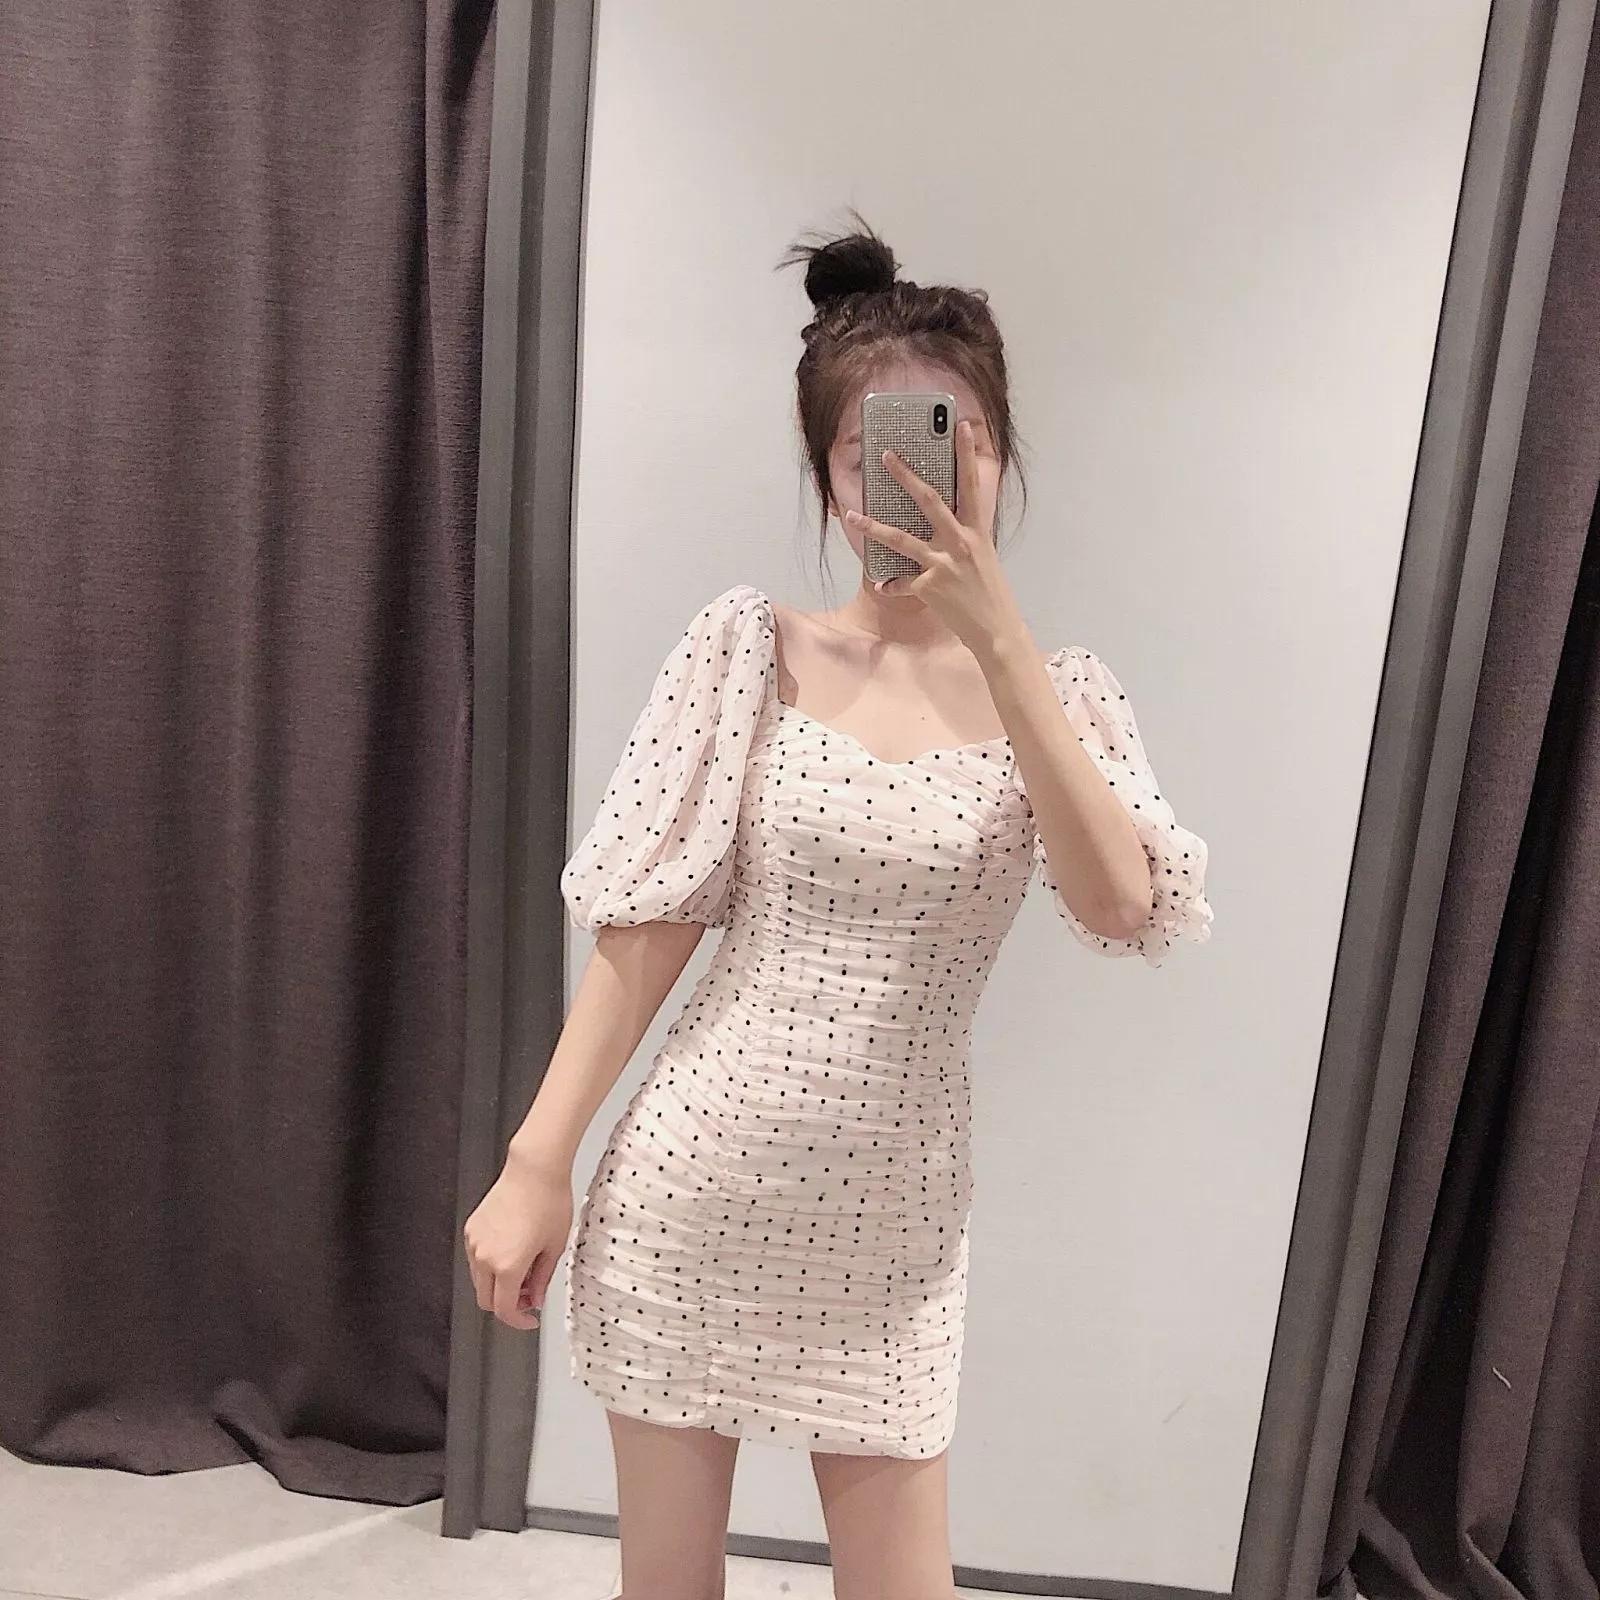 ZRN夏装新款神仙裙复古圆点绢网褶皱修身显瘦方领连衣裙 0003300券后68.00元